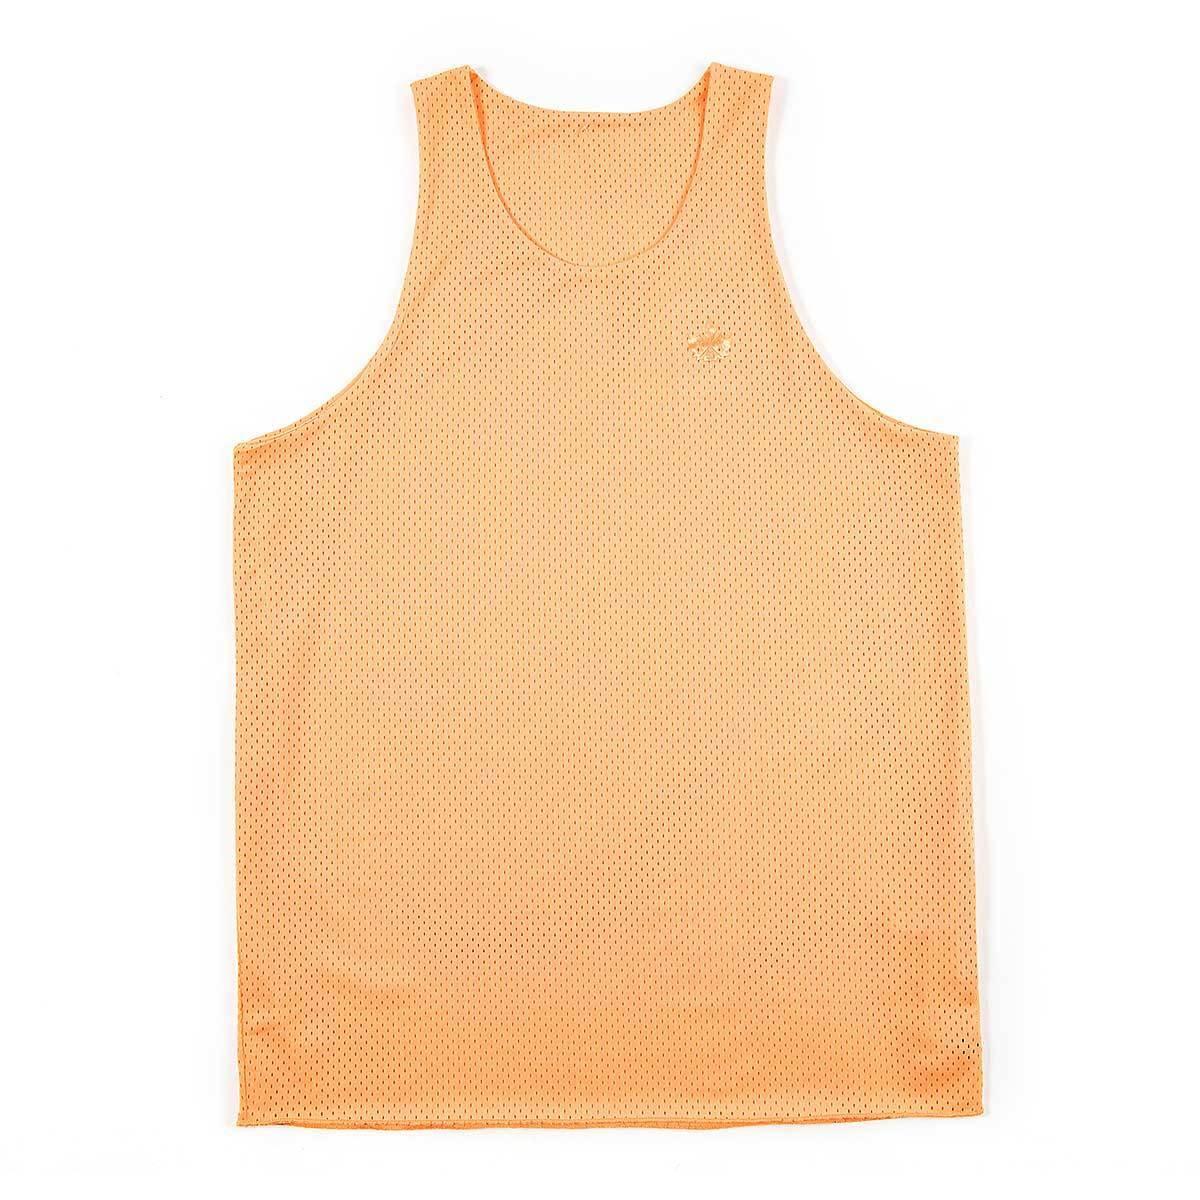 K1X Basketball Reversible Pastel Mesh Jersey Apricot